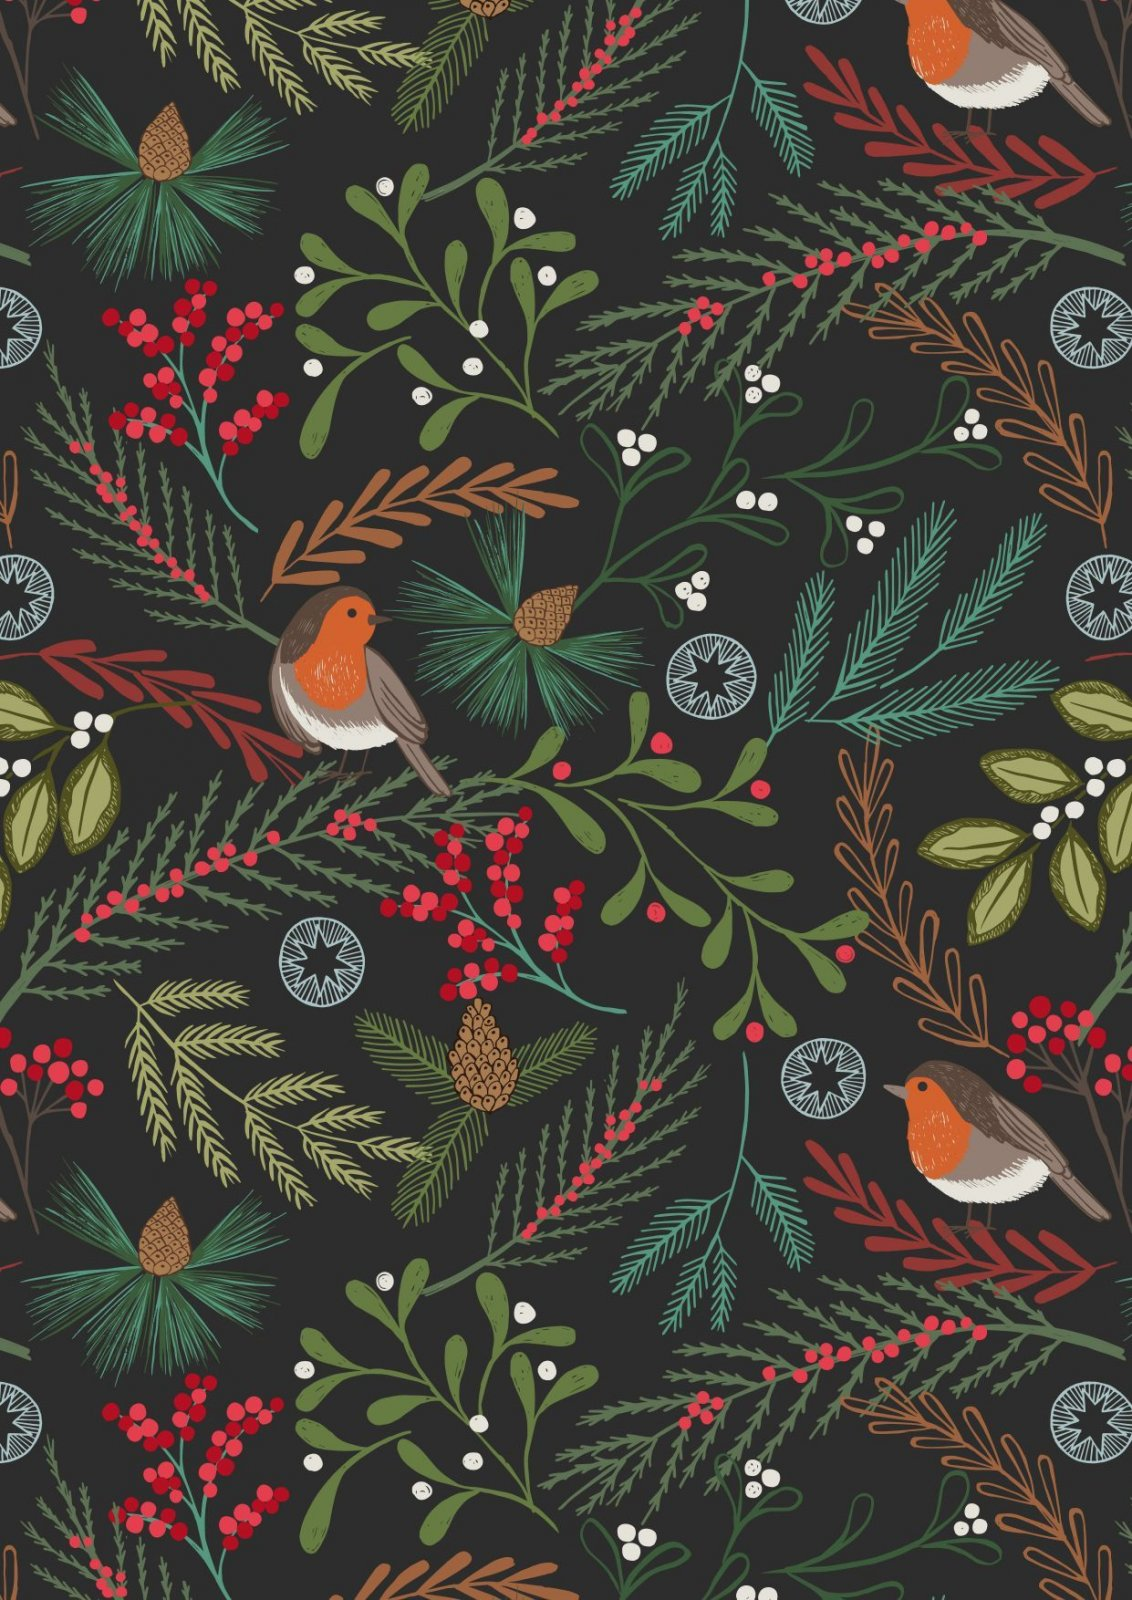 New Forest Winter - Robin - Black